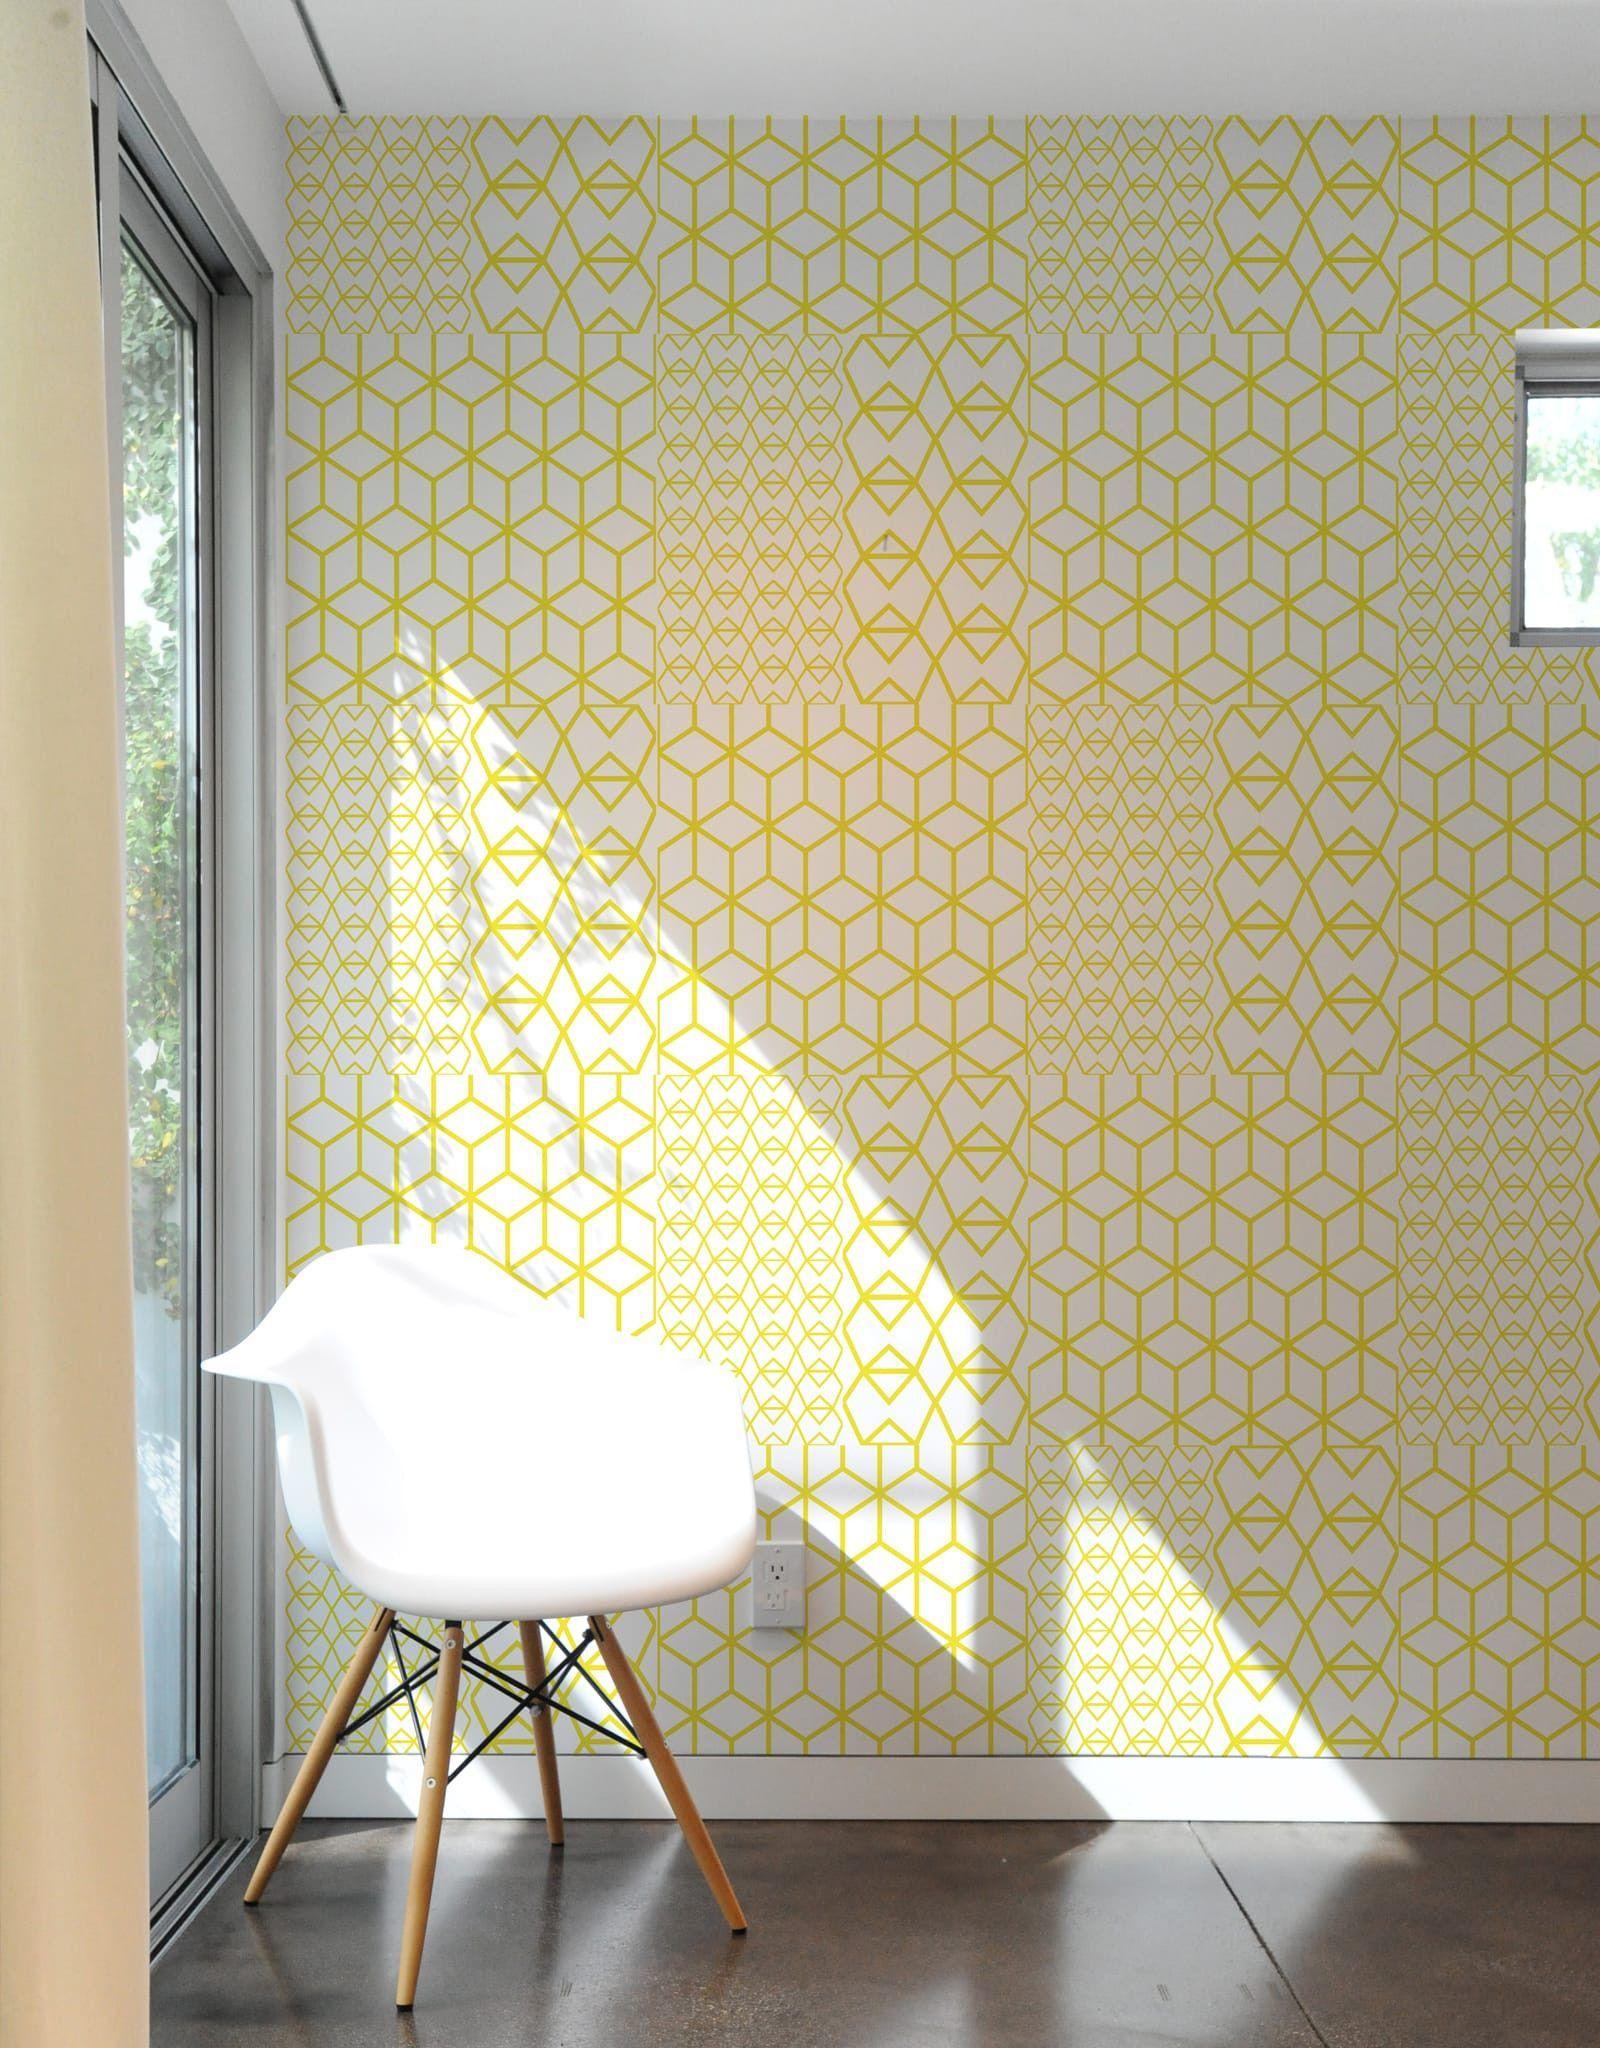 Modern Wall Pattern Ideas Festooning - The Wall Art Decorations ...